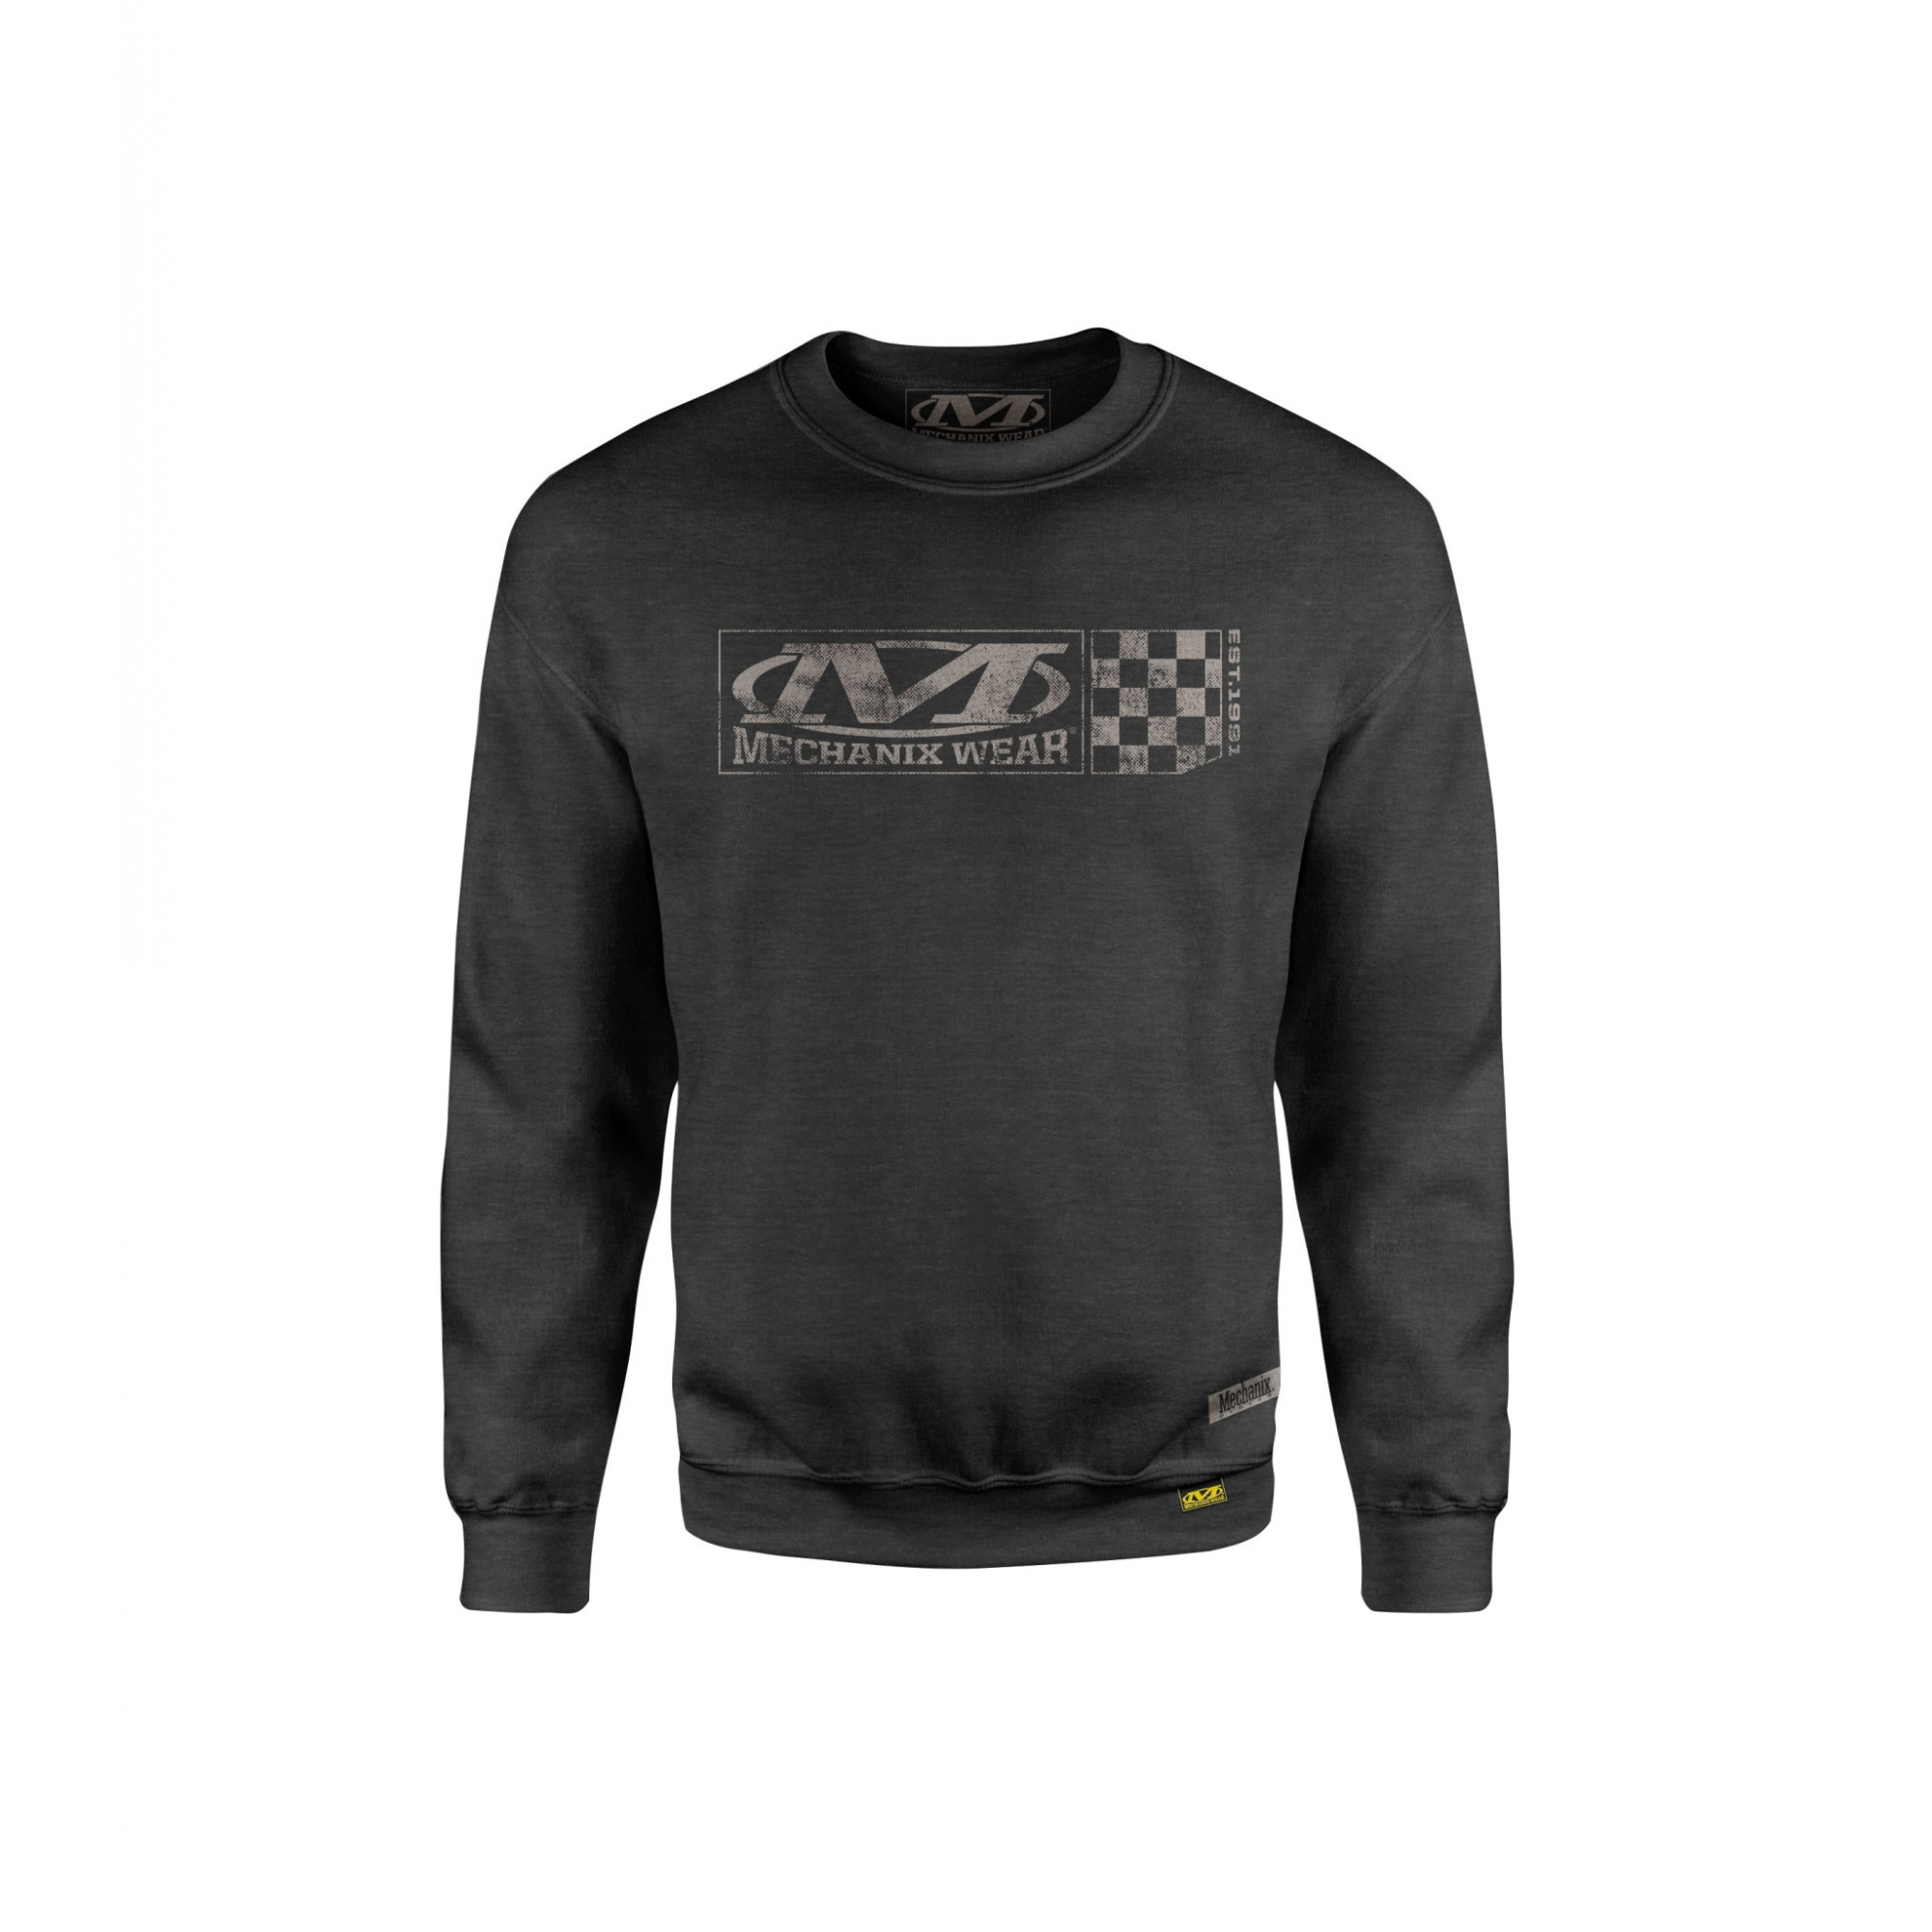 Moletom Velocity Crew Sweatshirt - Mechanix